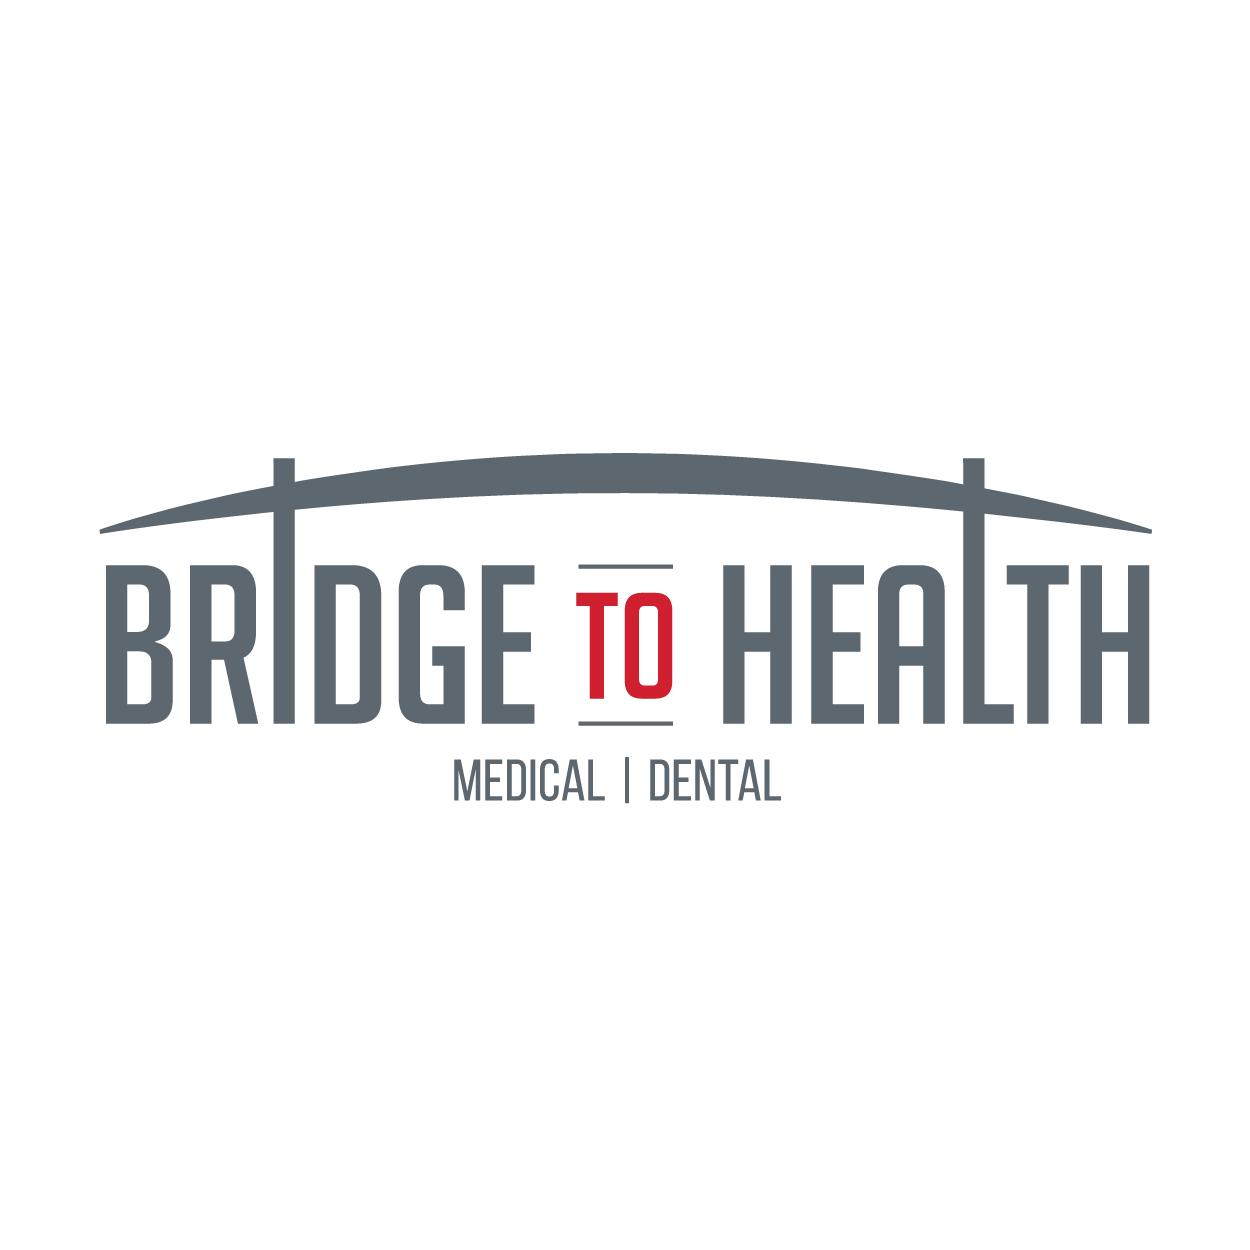 Bth_new_logo